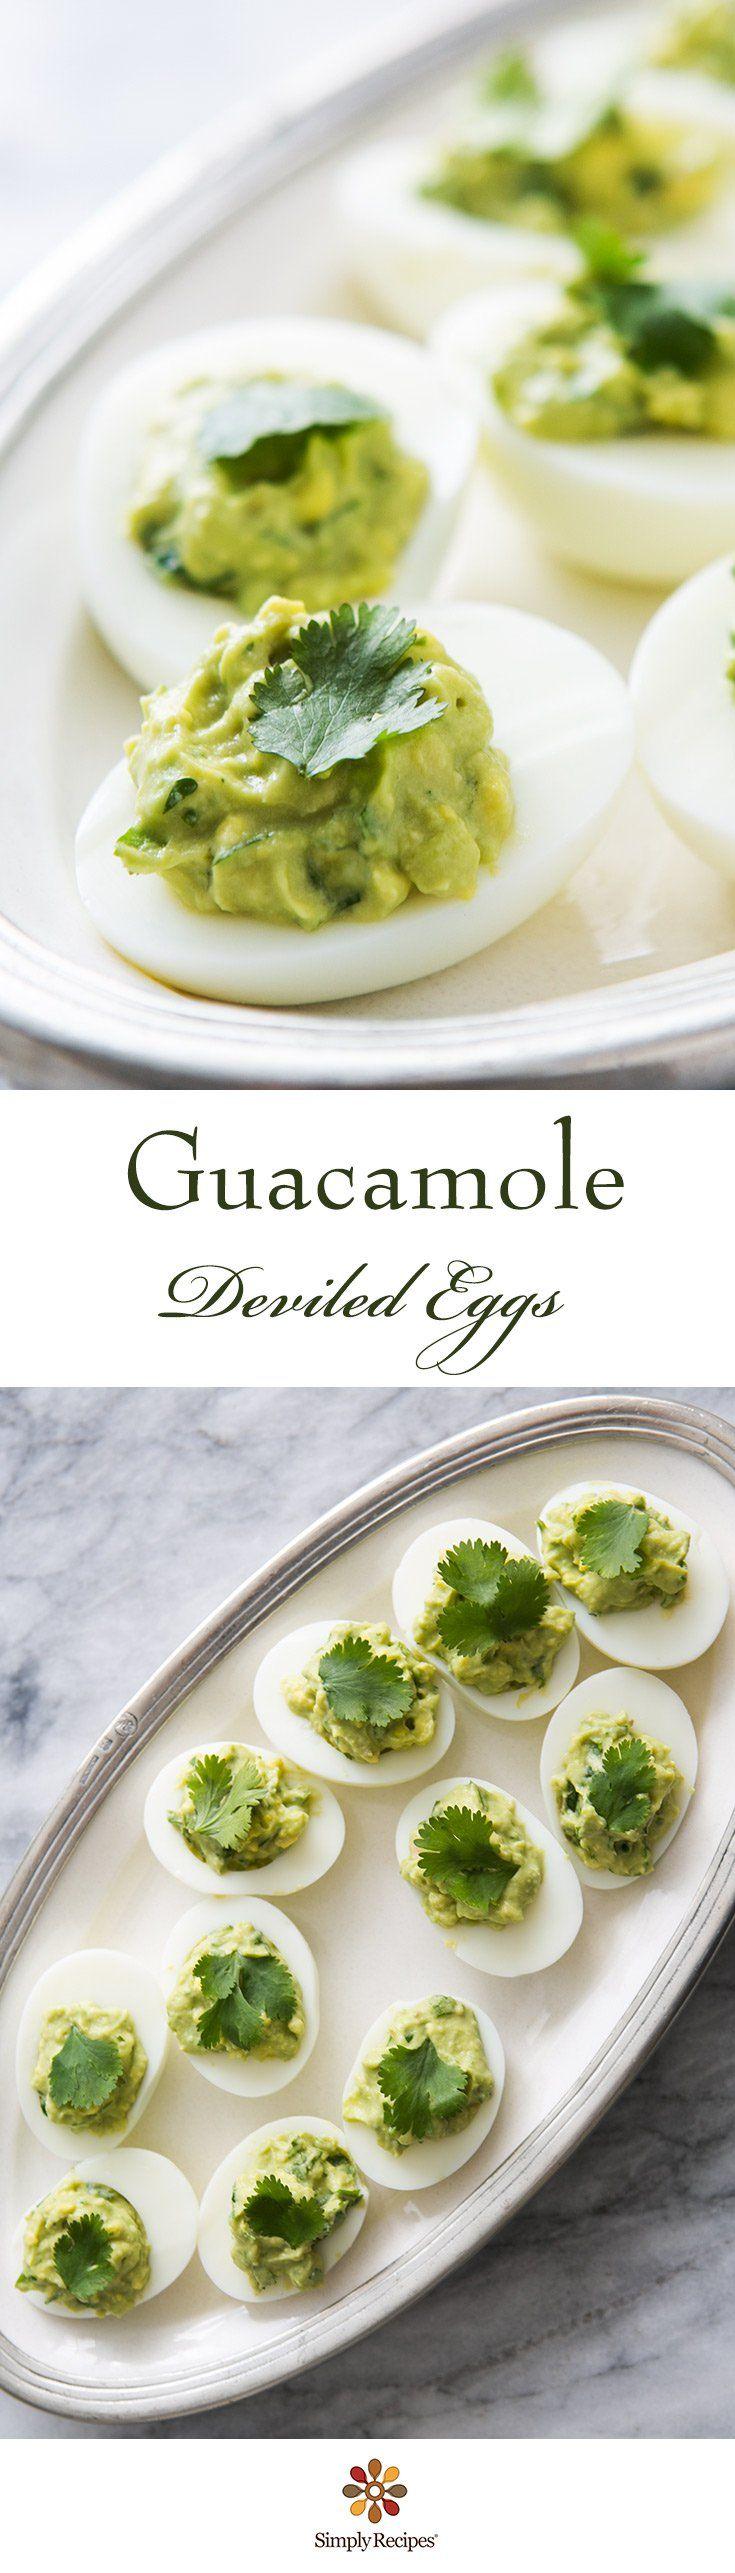 Guacamole Deviled Eggs ~ Green deviled eggs! Hard boiled egg halves, stuffed with avocado guacamole. ~ SimplyRecipes.com